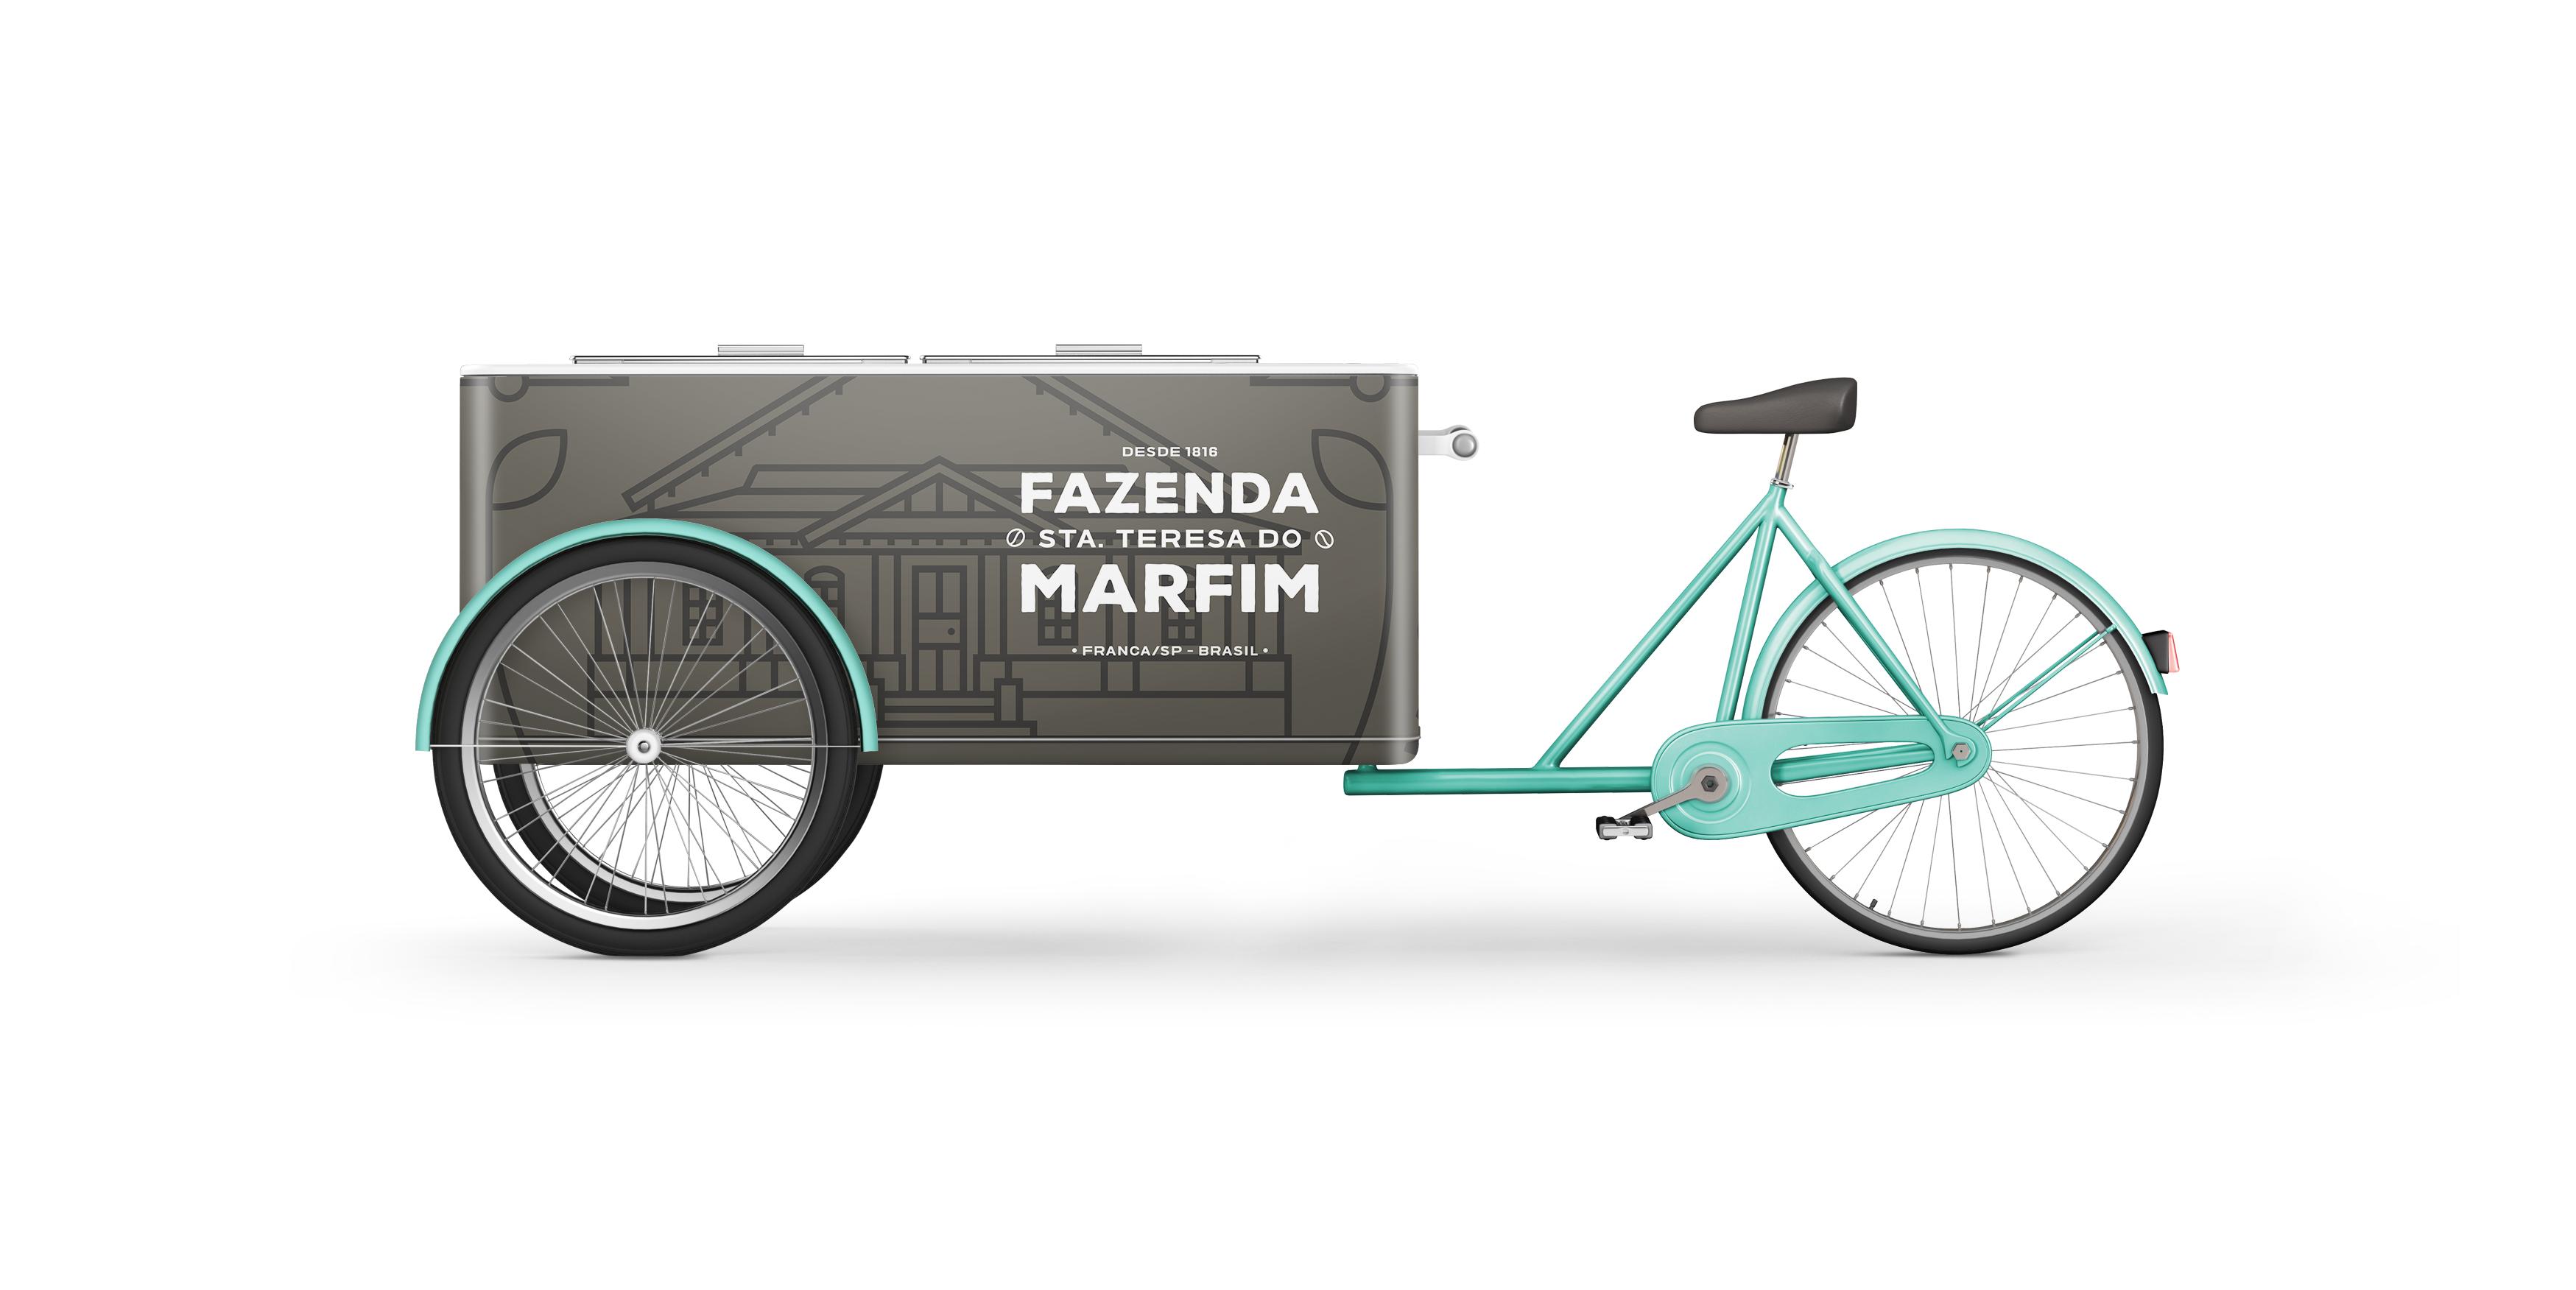 Fazenda-Marfim_Branding_09